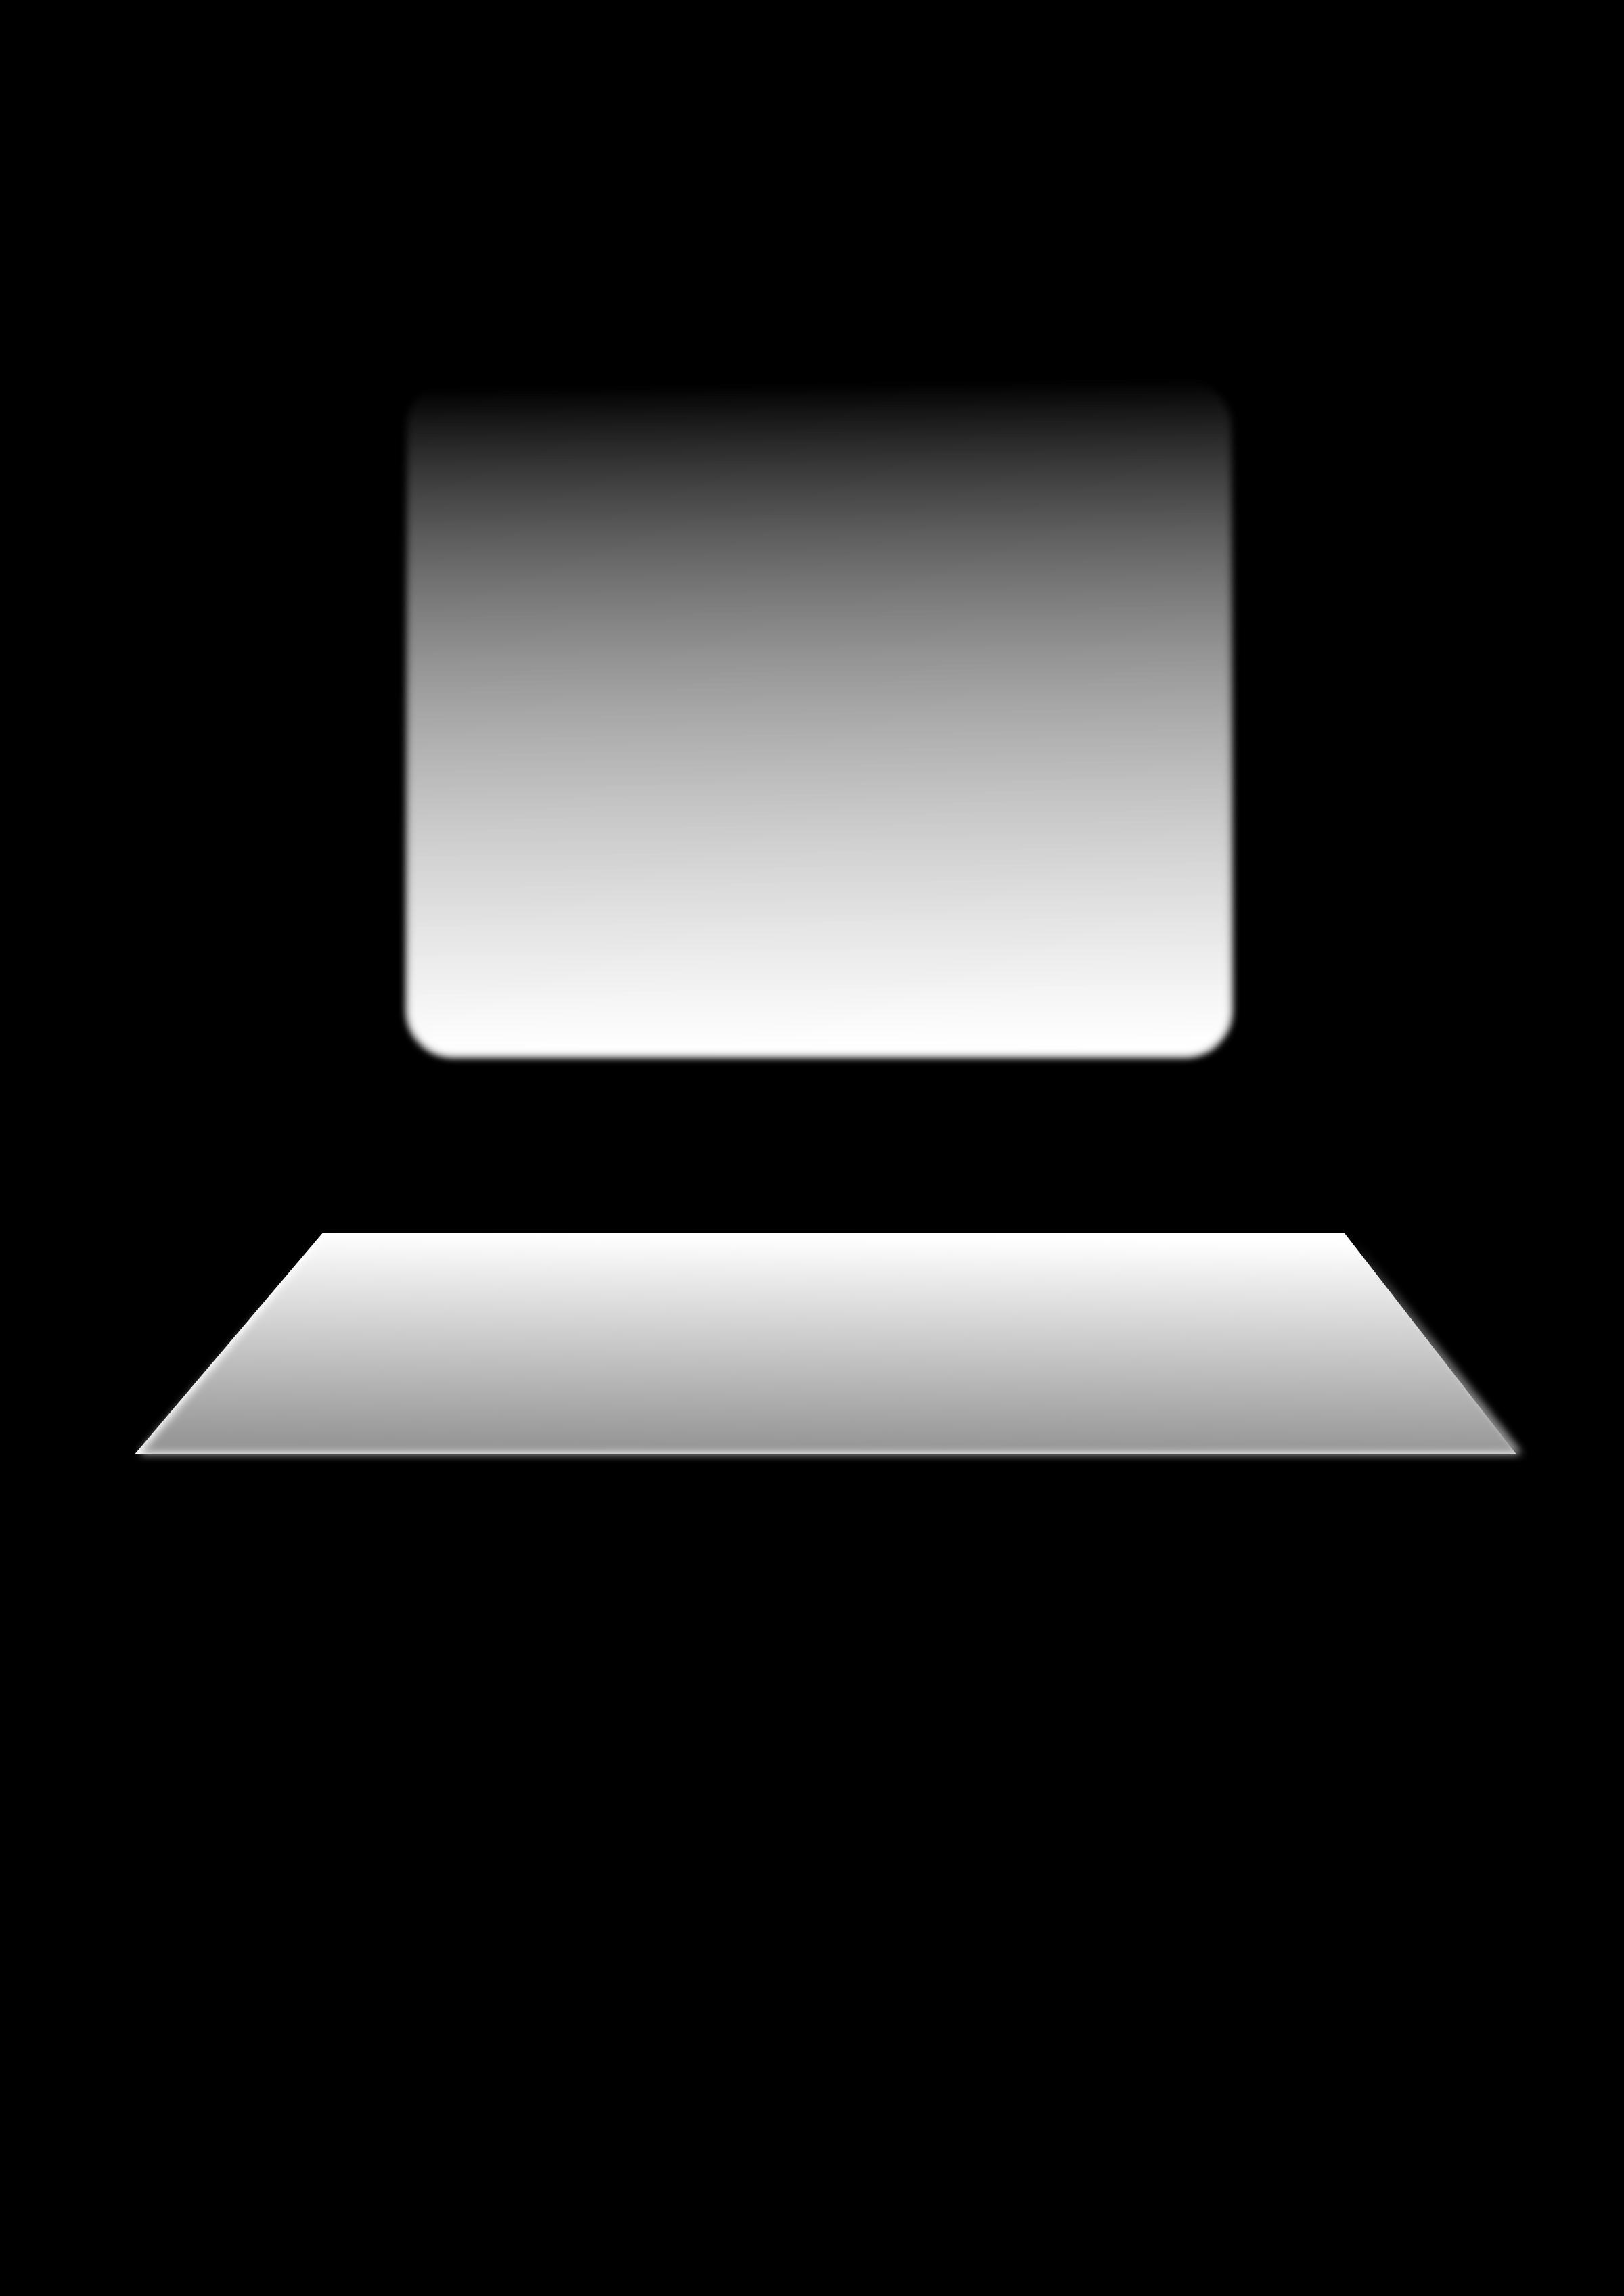 Technology clipart computer user. Workstation big image png